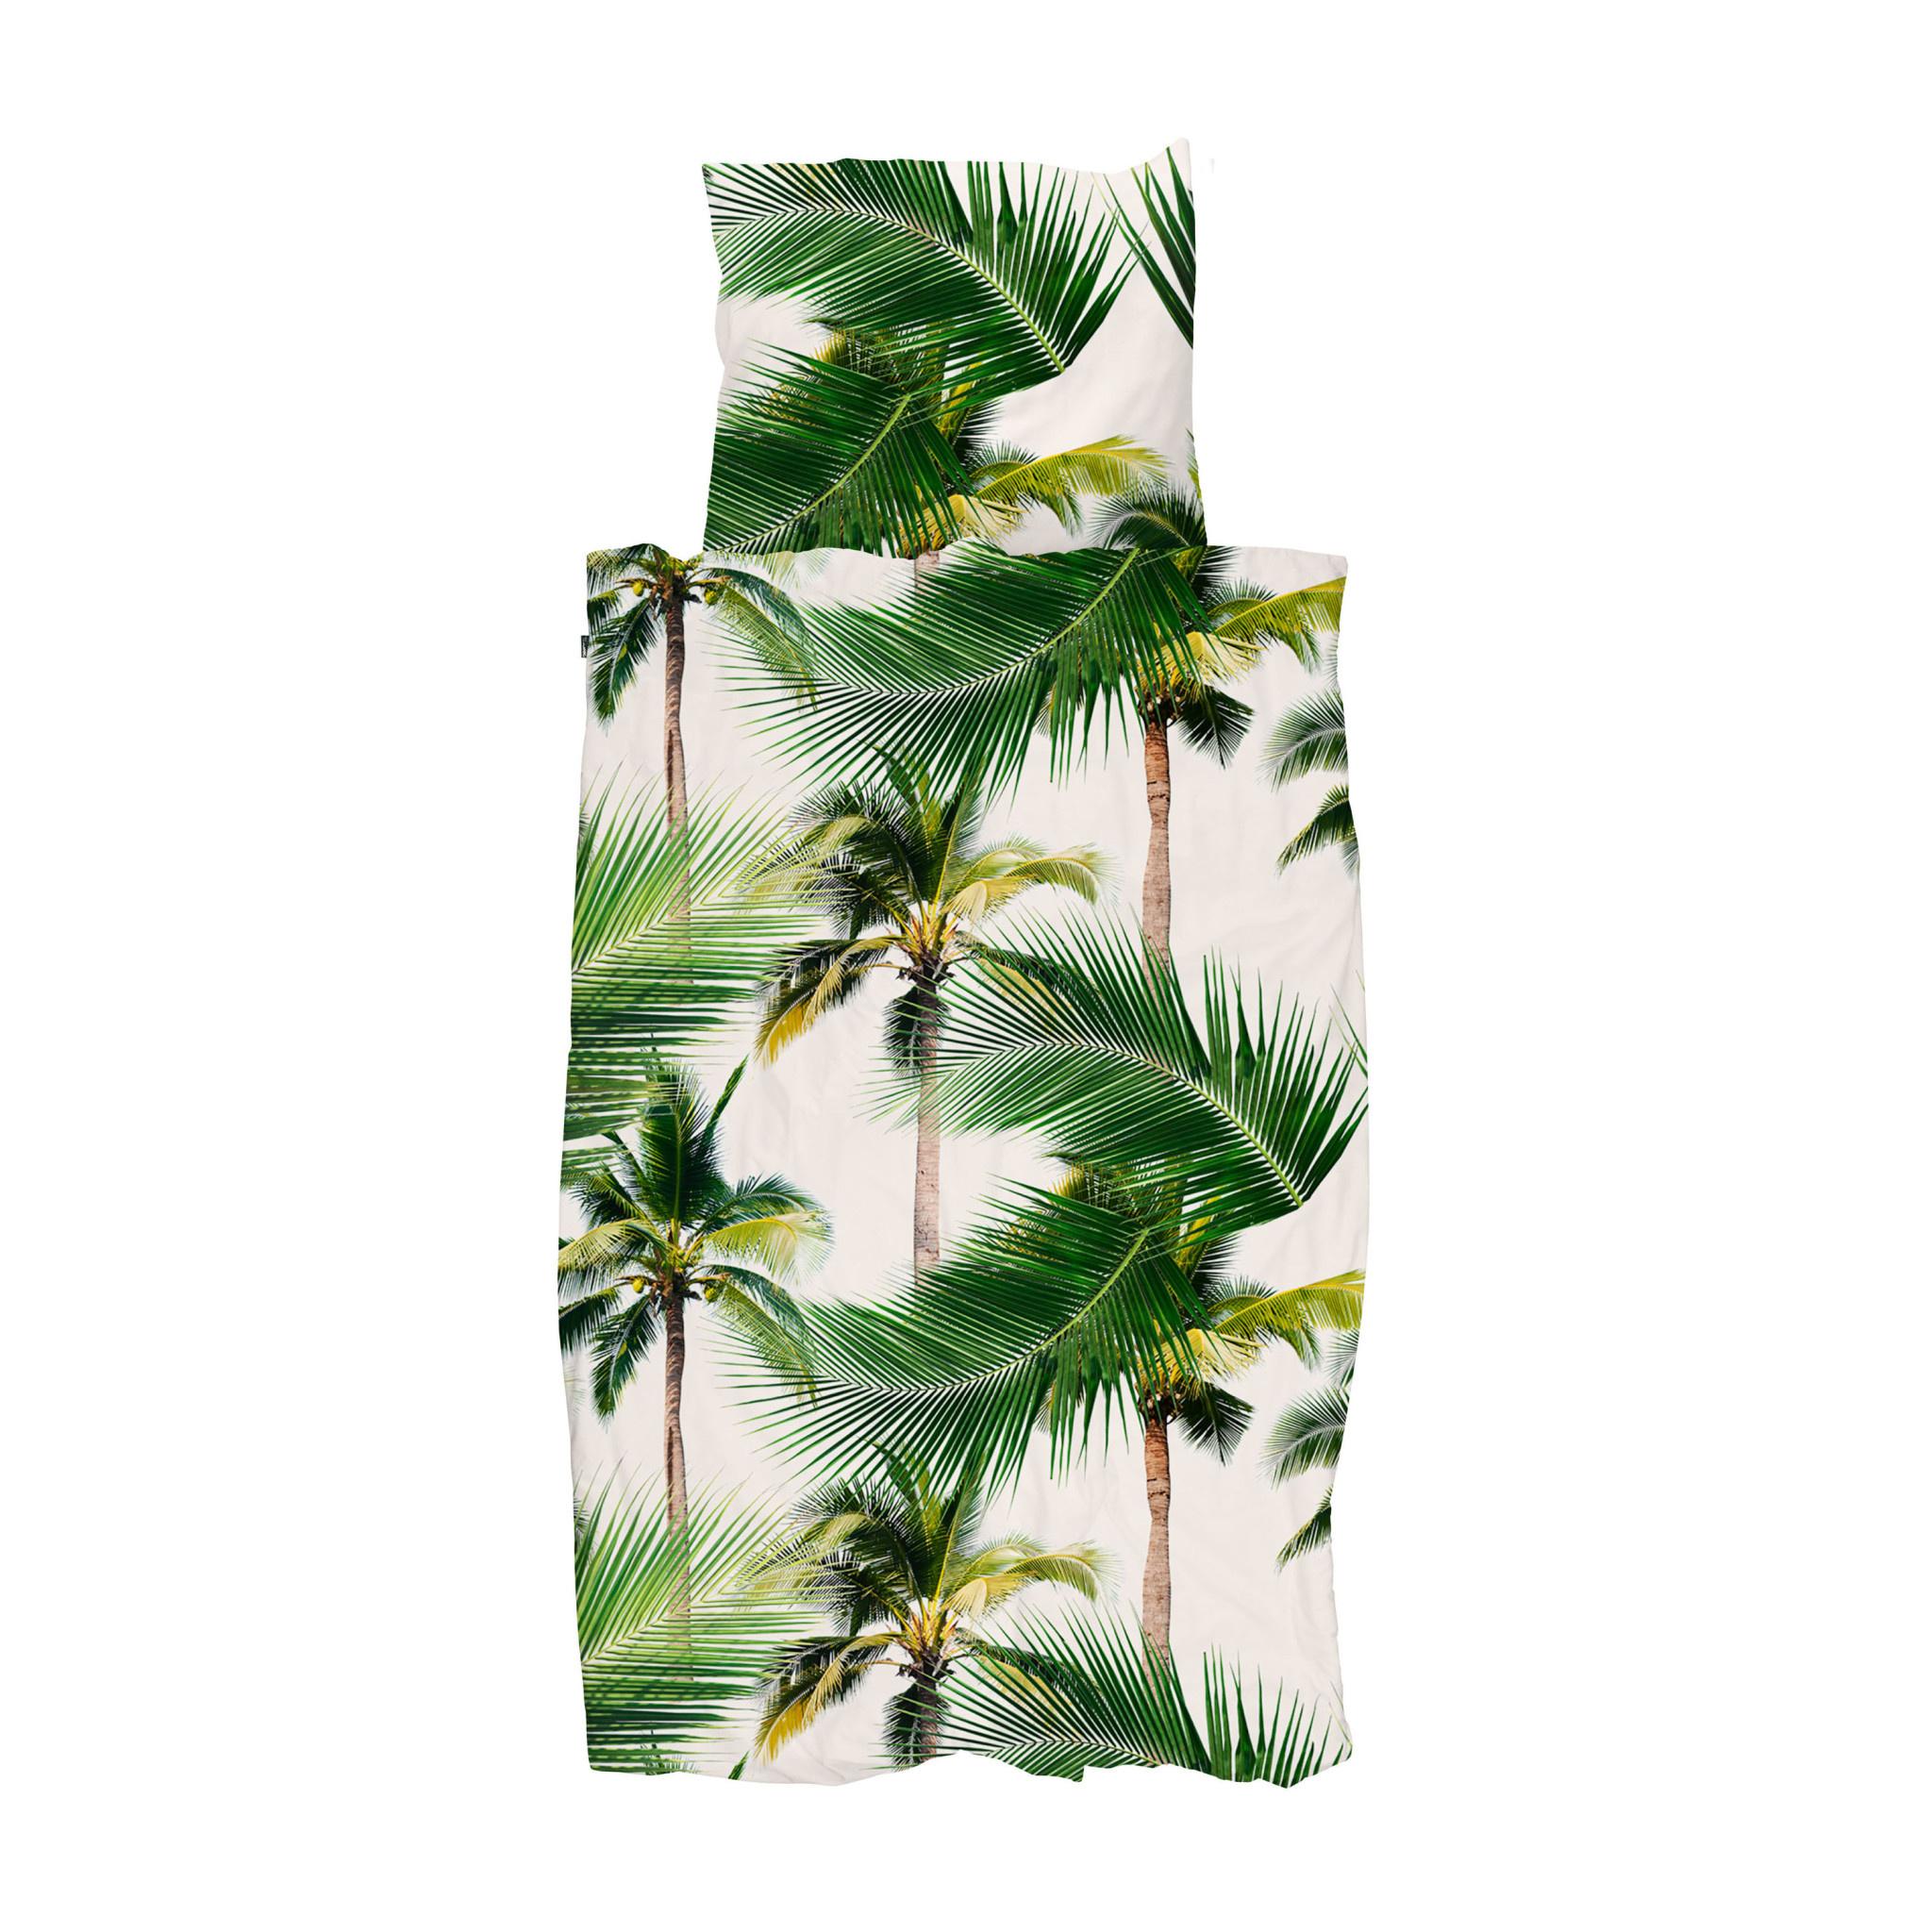 SNURK beddengoed Housse de couette Palm Beach 1p - Snurk